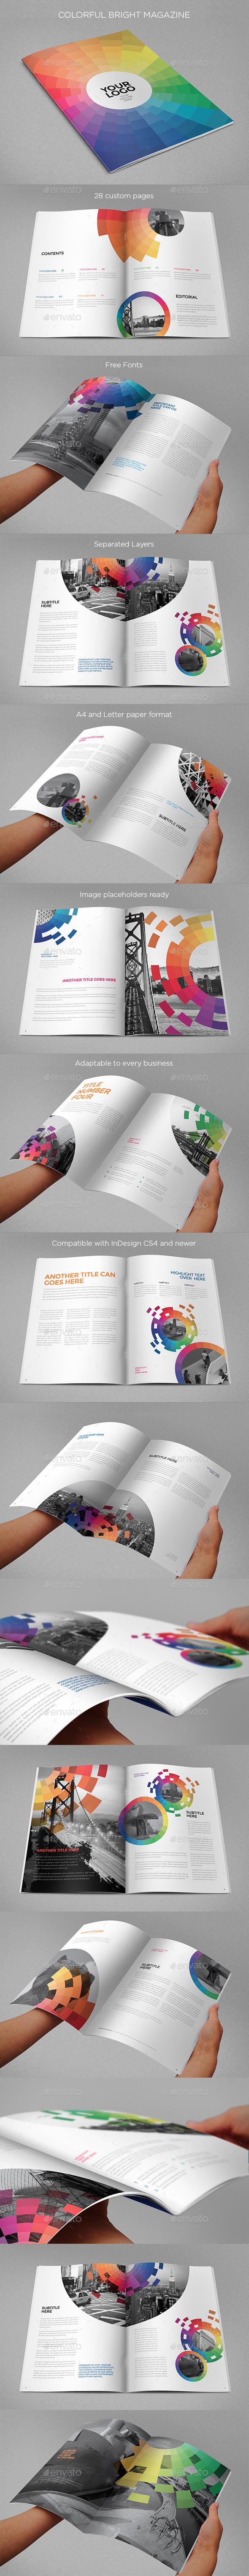 Colorful Bright Magazine - Magazines Print Templates